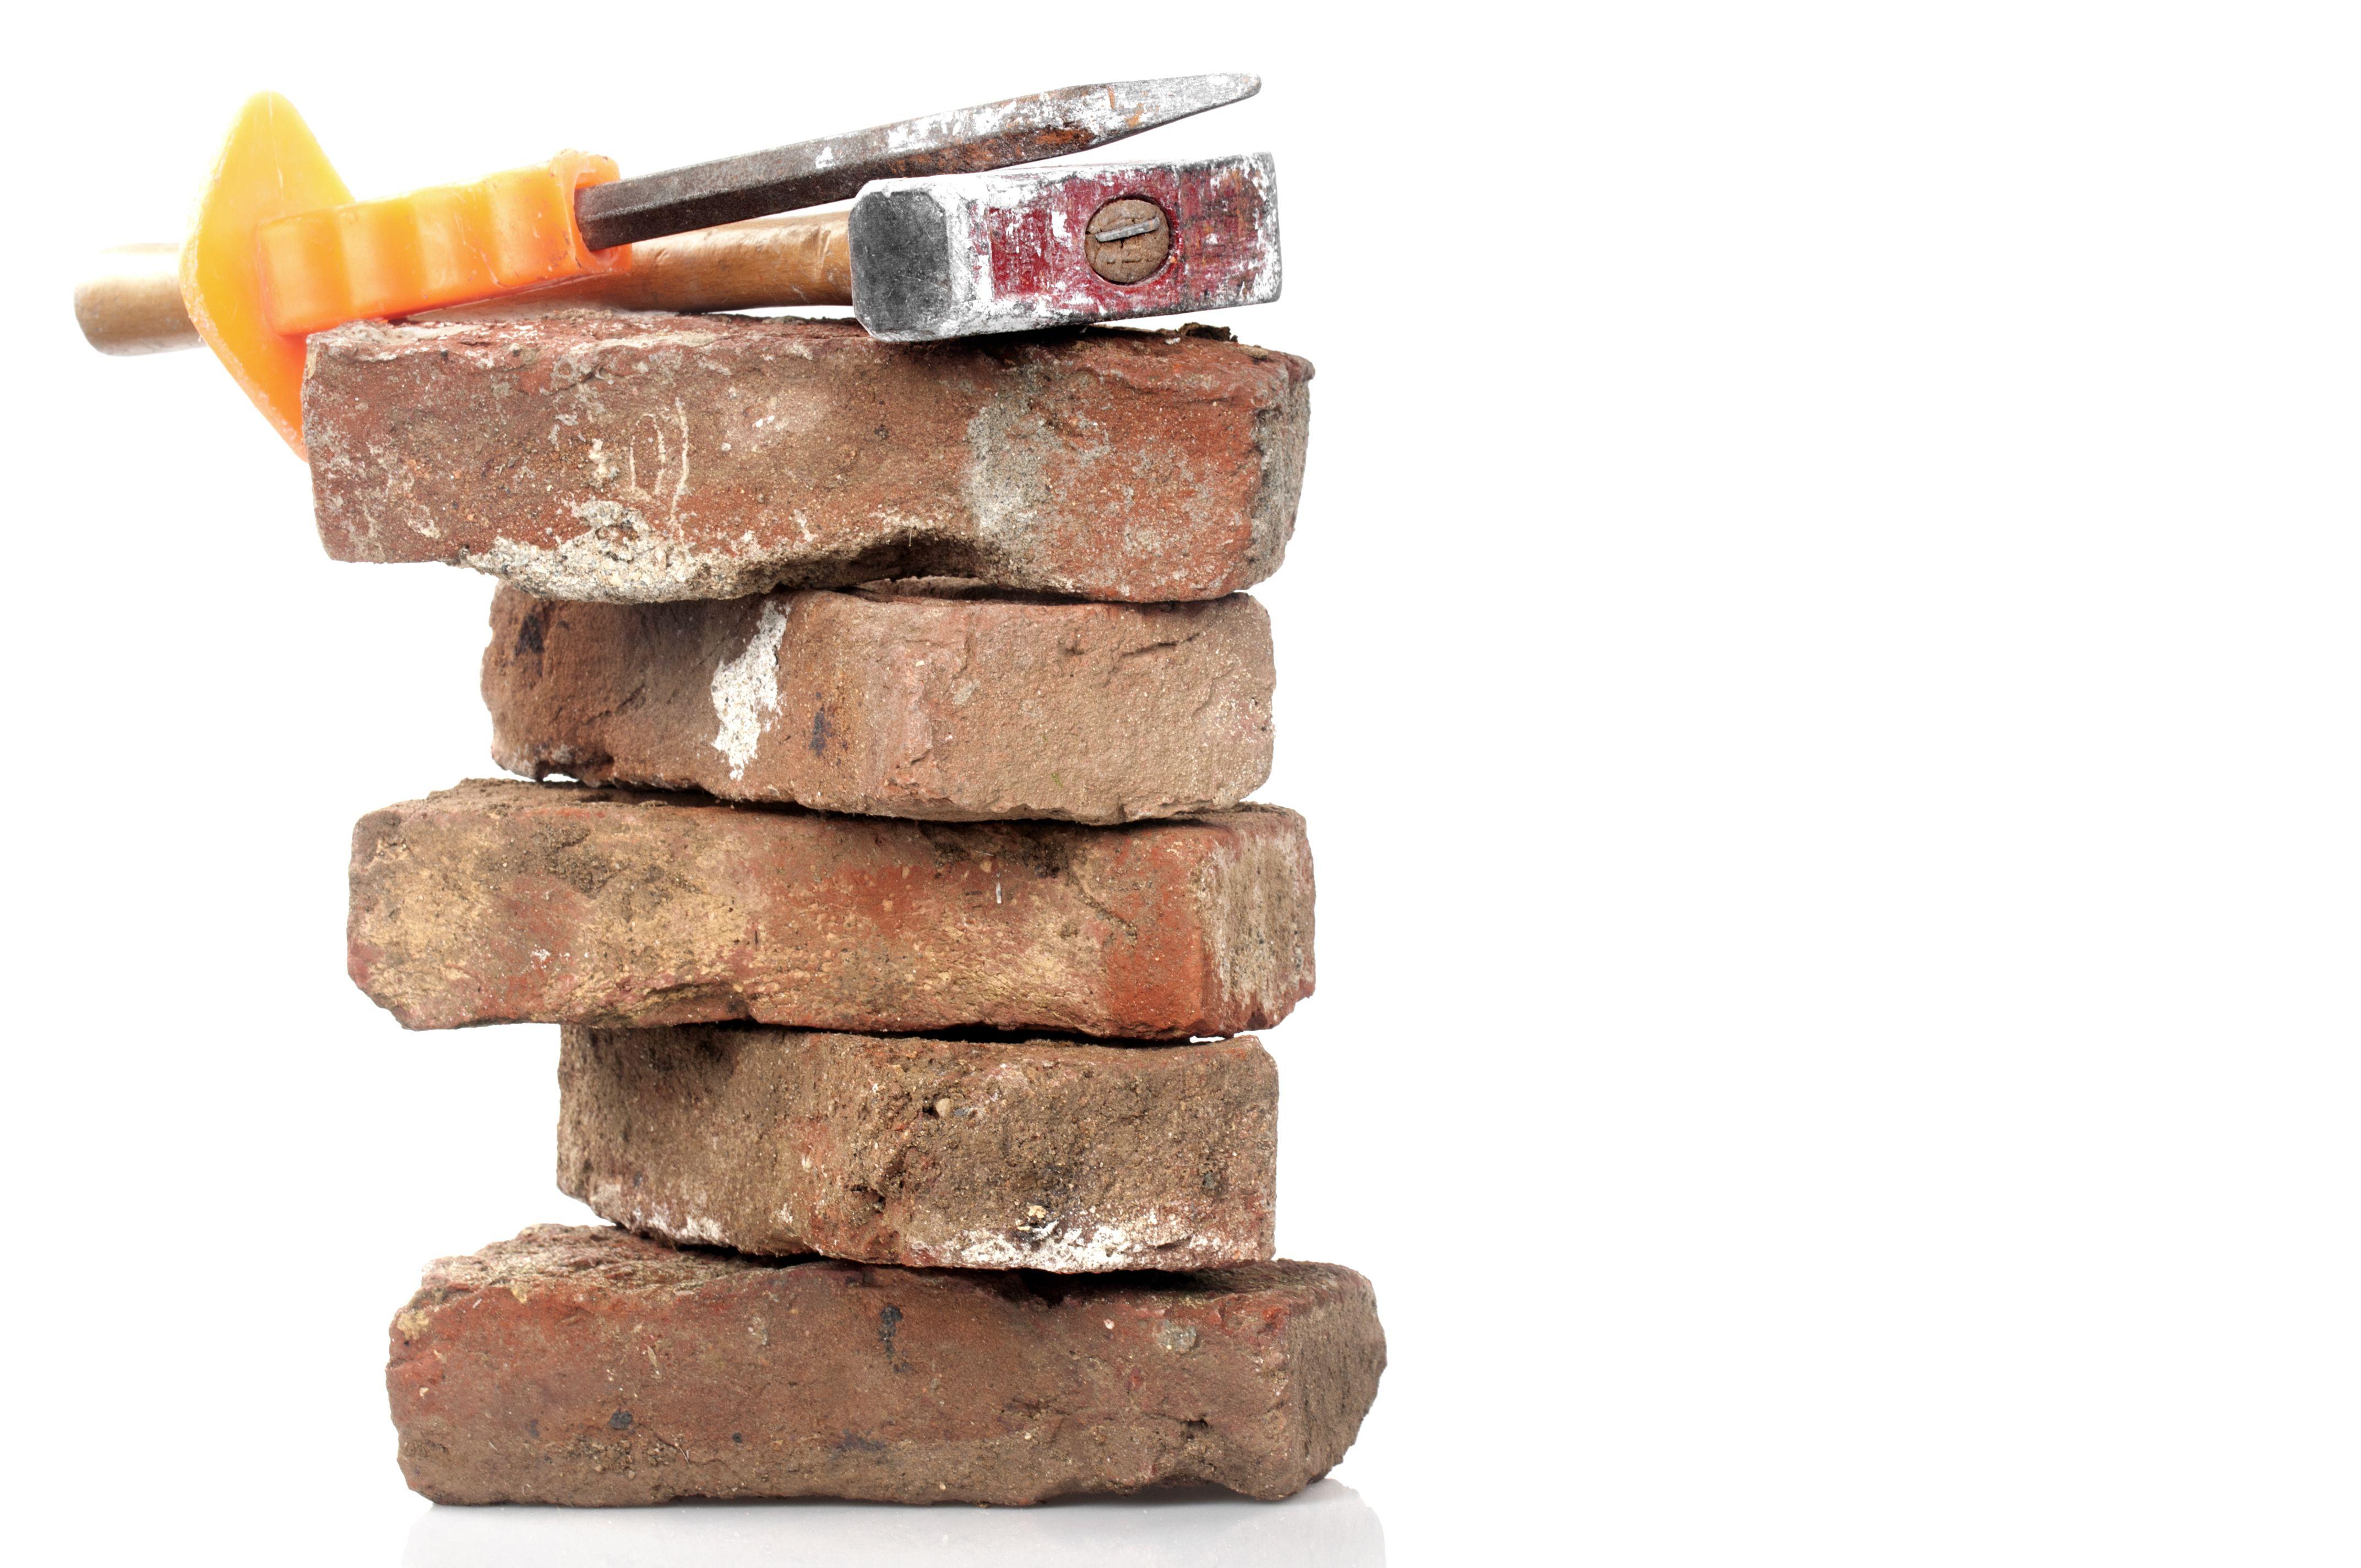 single brick removal manual method no special tools